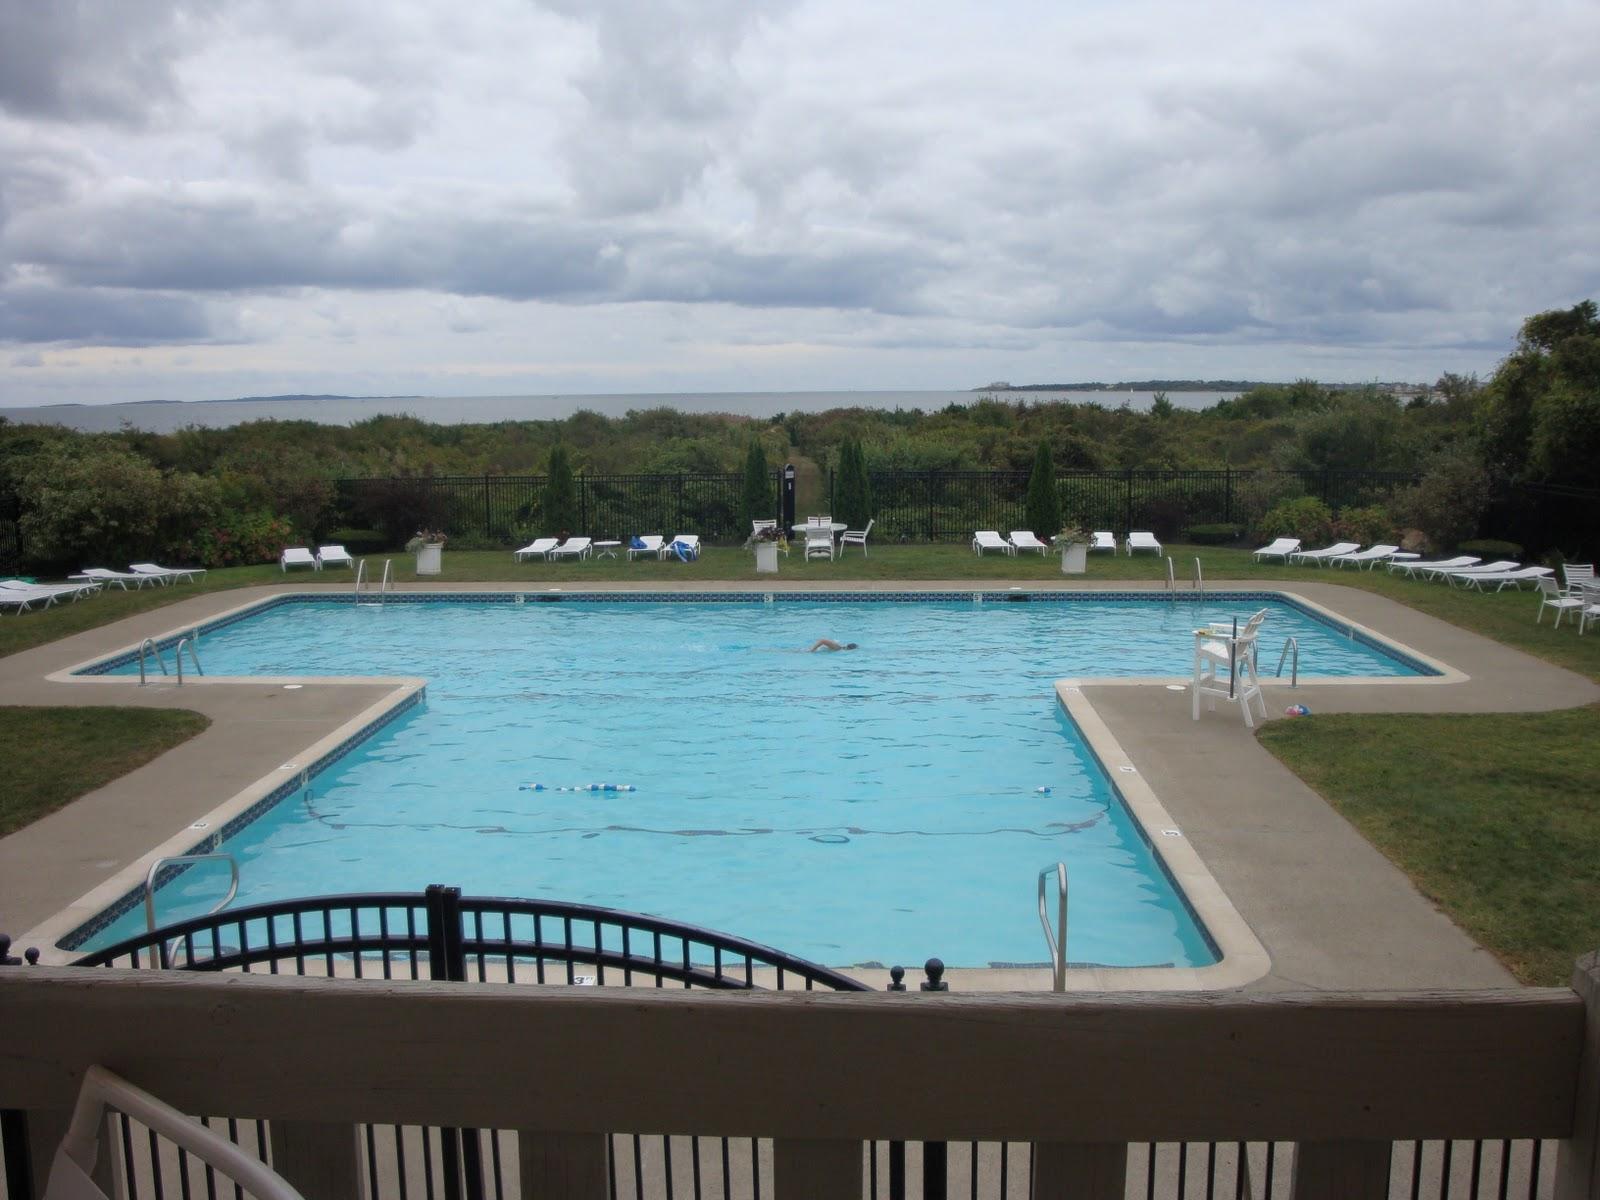 50 Swims Swim 24 Round Hill Pool S Dartmouth Ma